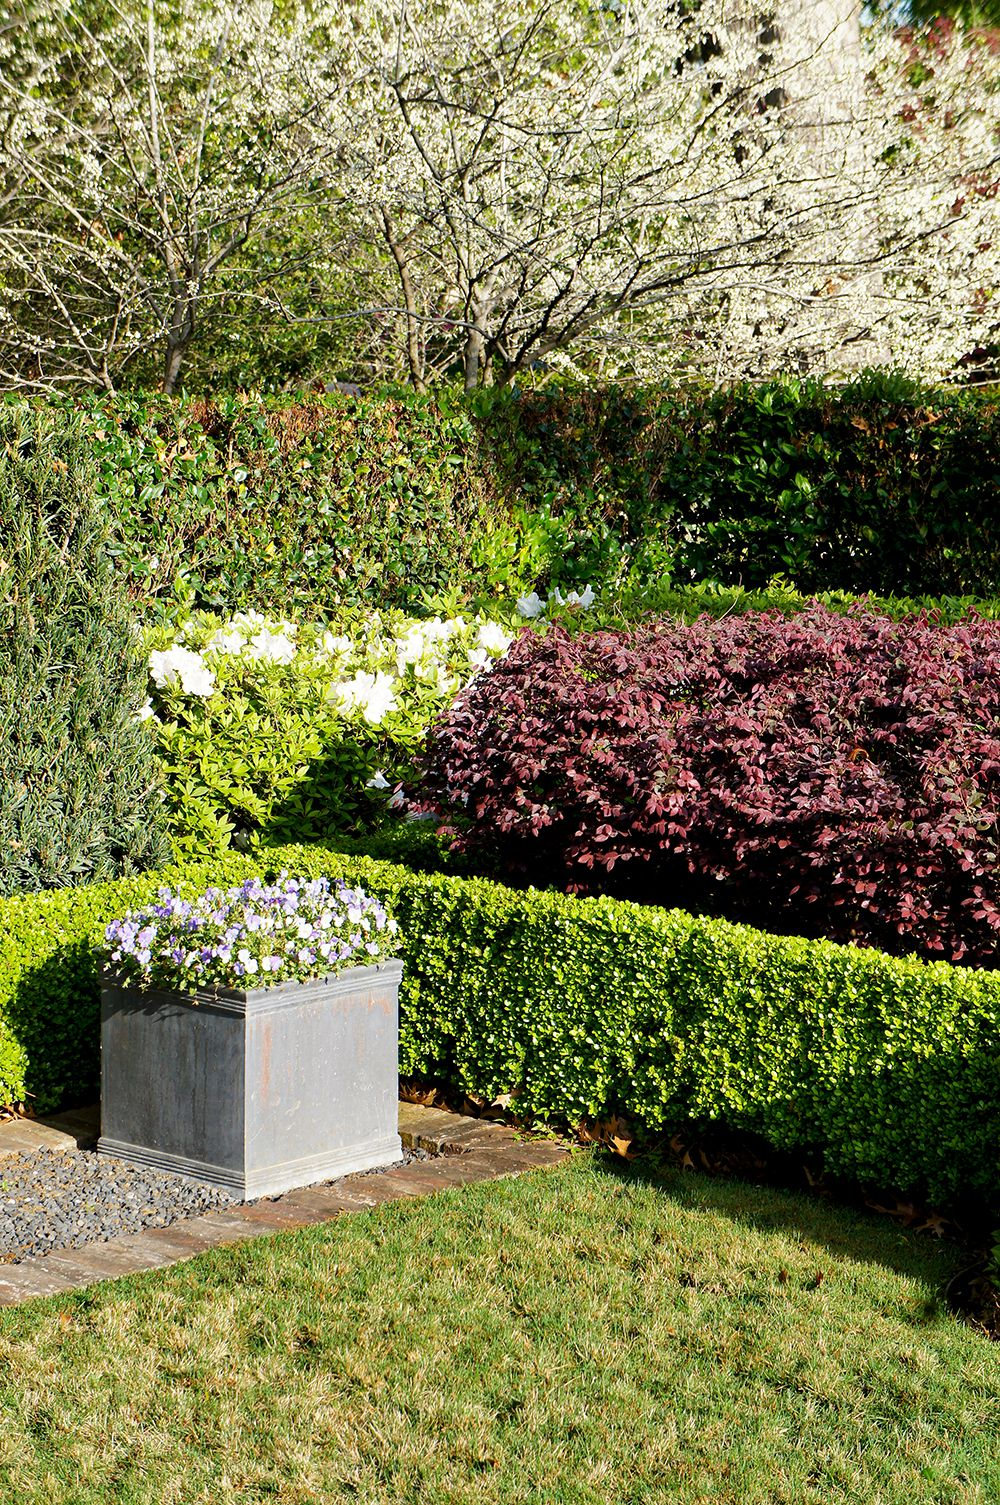 loropetalum hedge sits trimmed